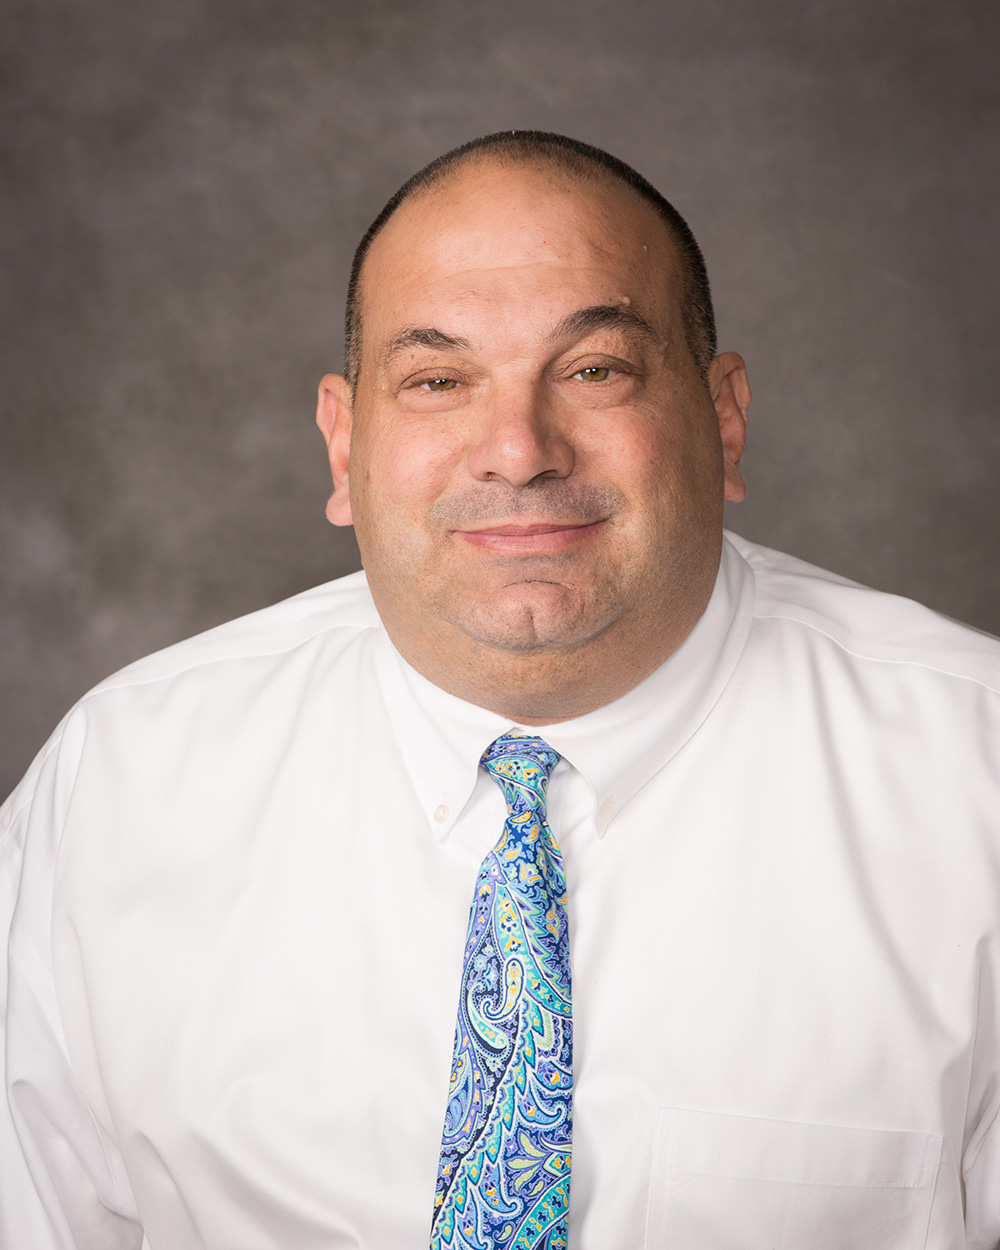 Male Vice Chairman